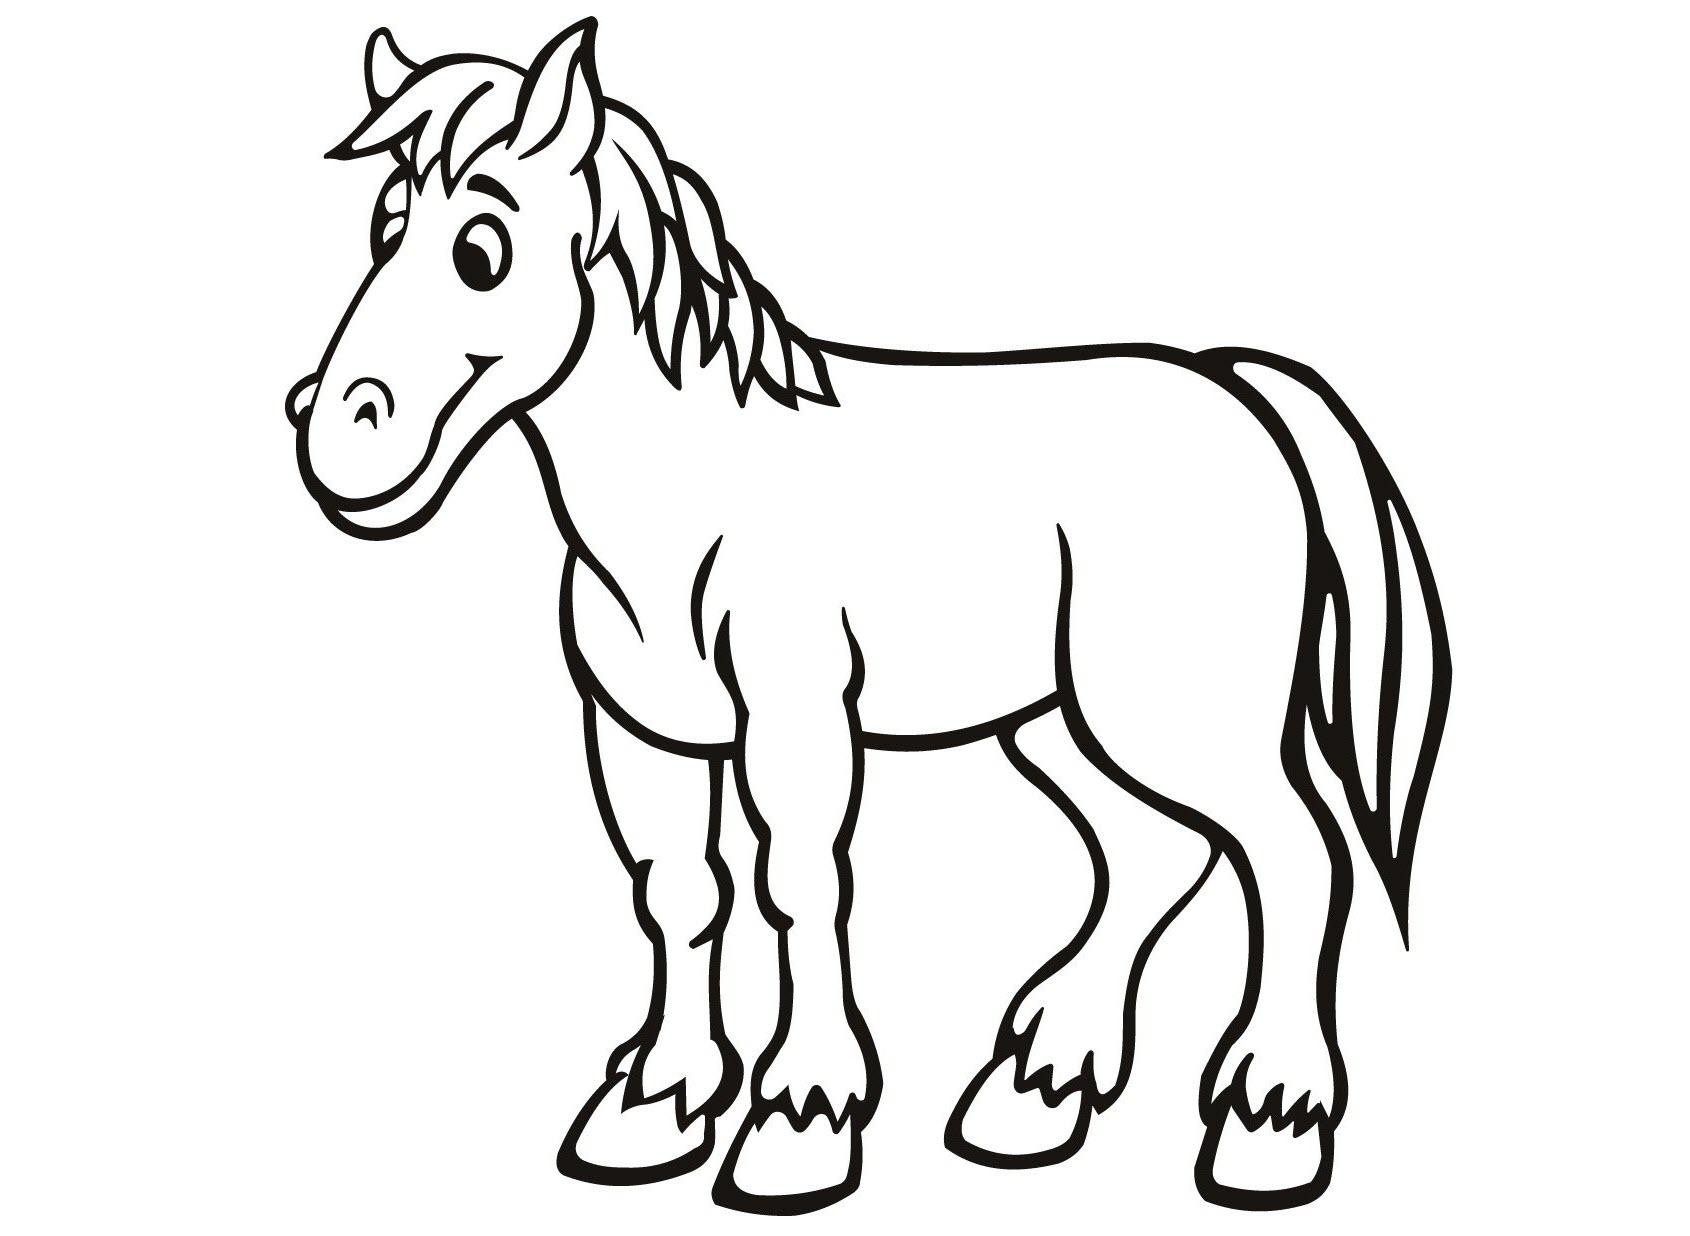 Horse coloring pages preschool